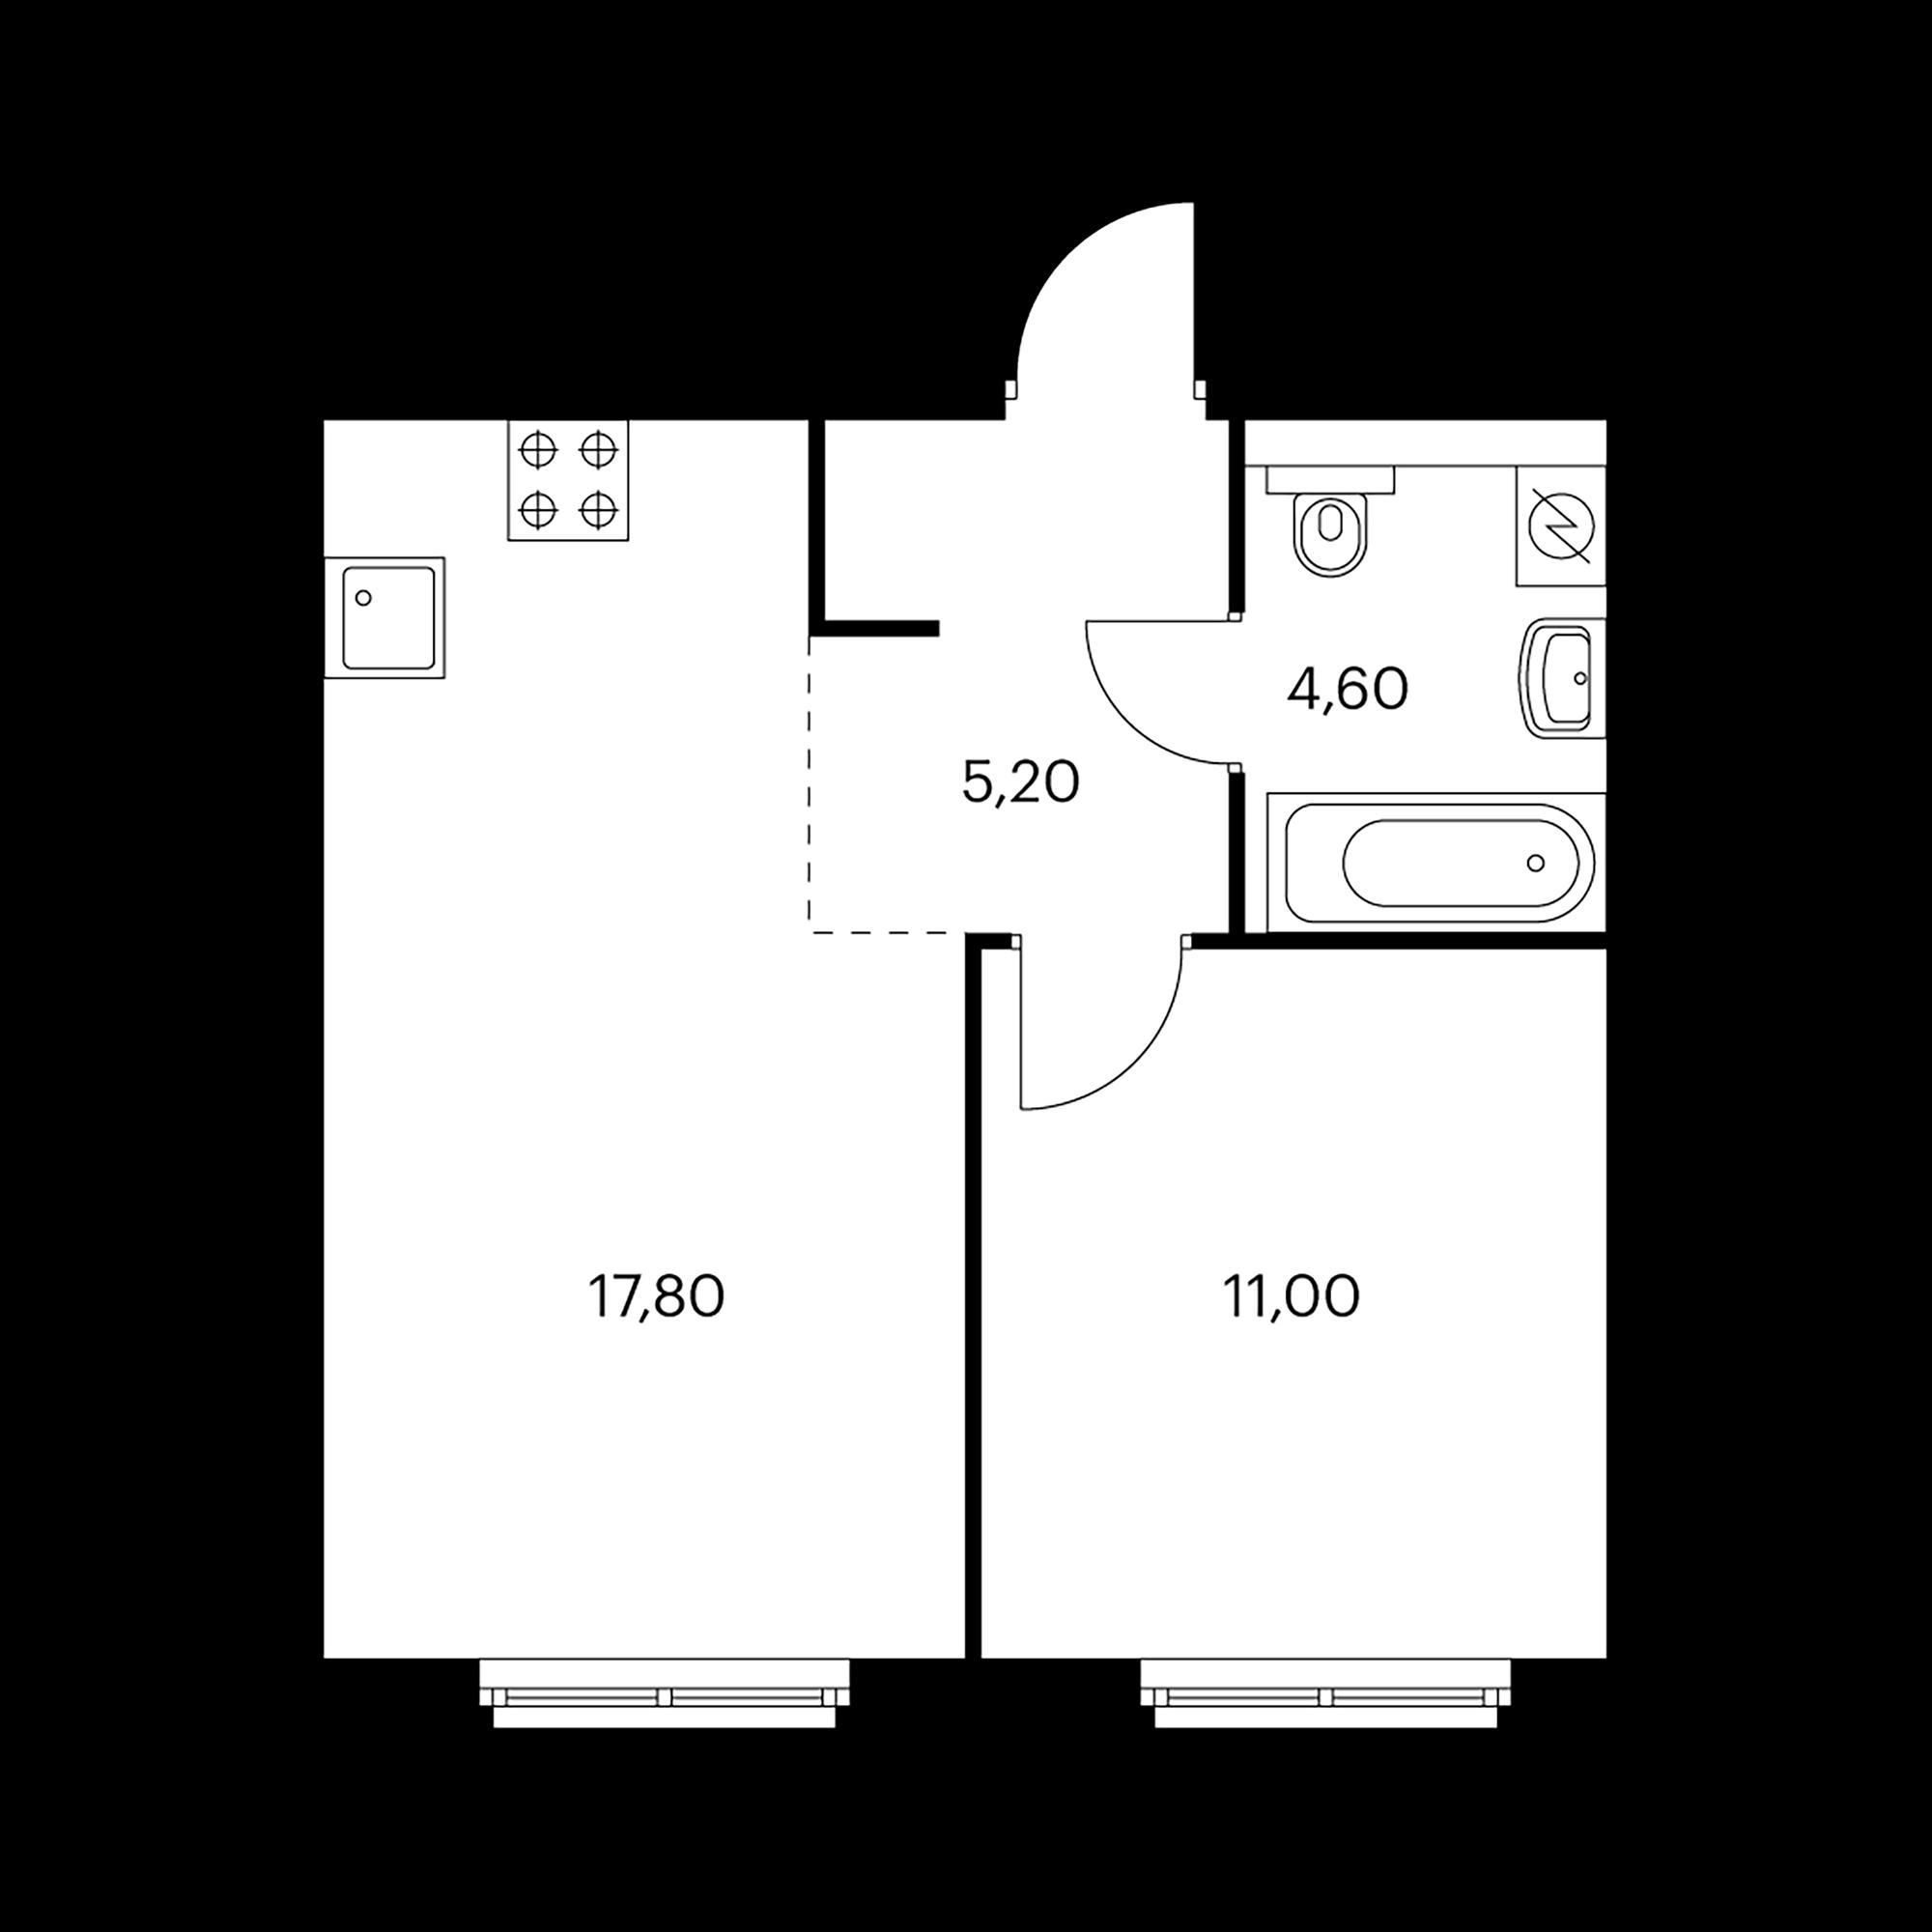 1EL3-4